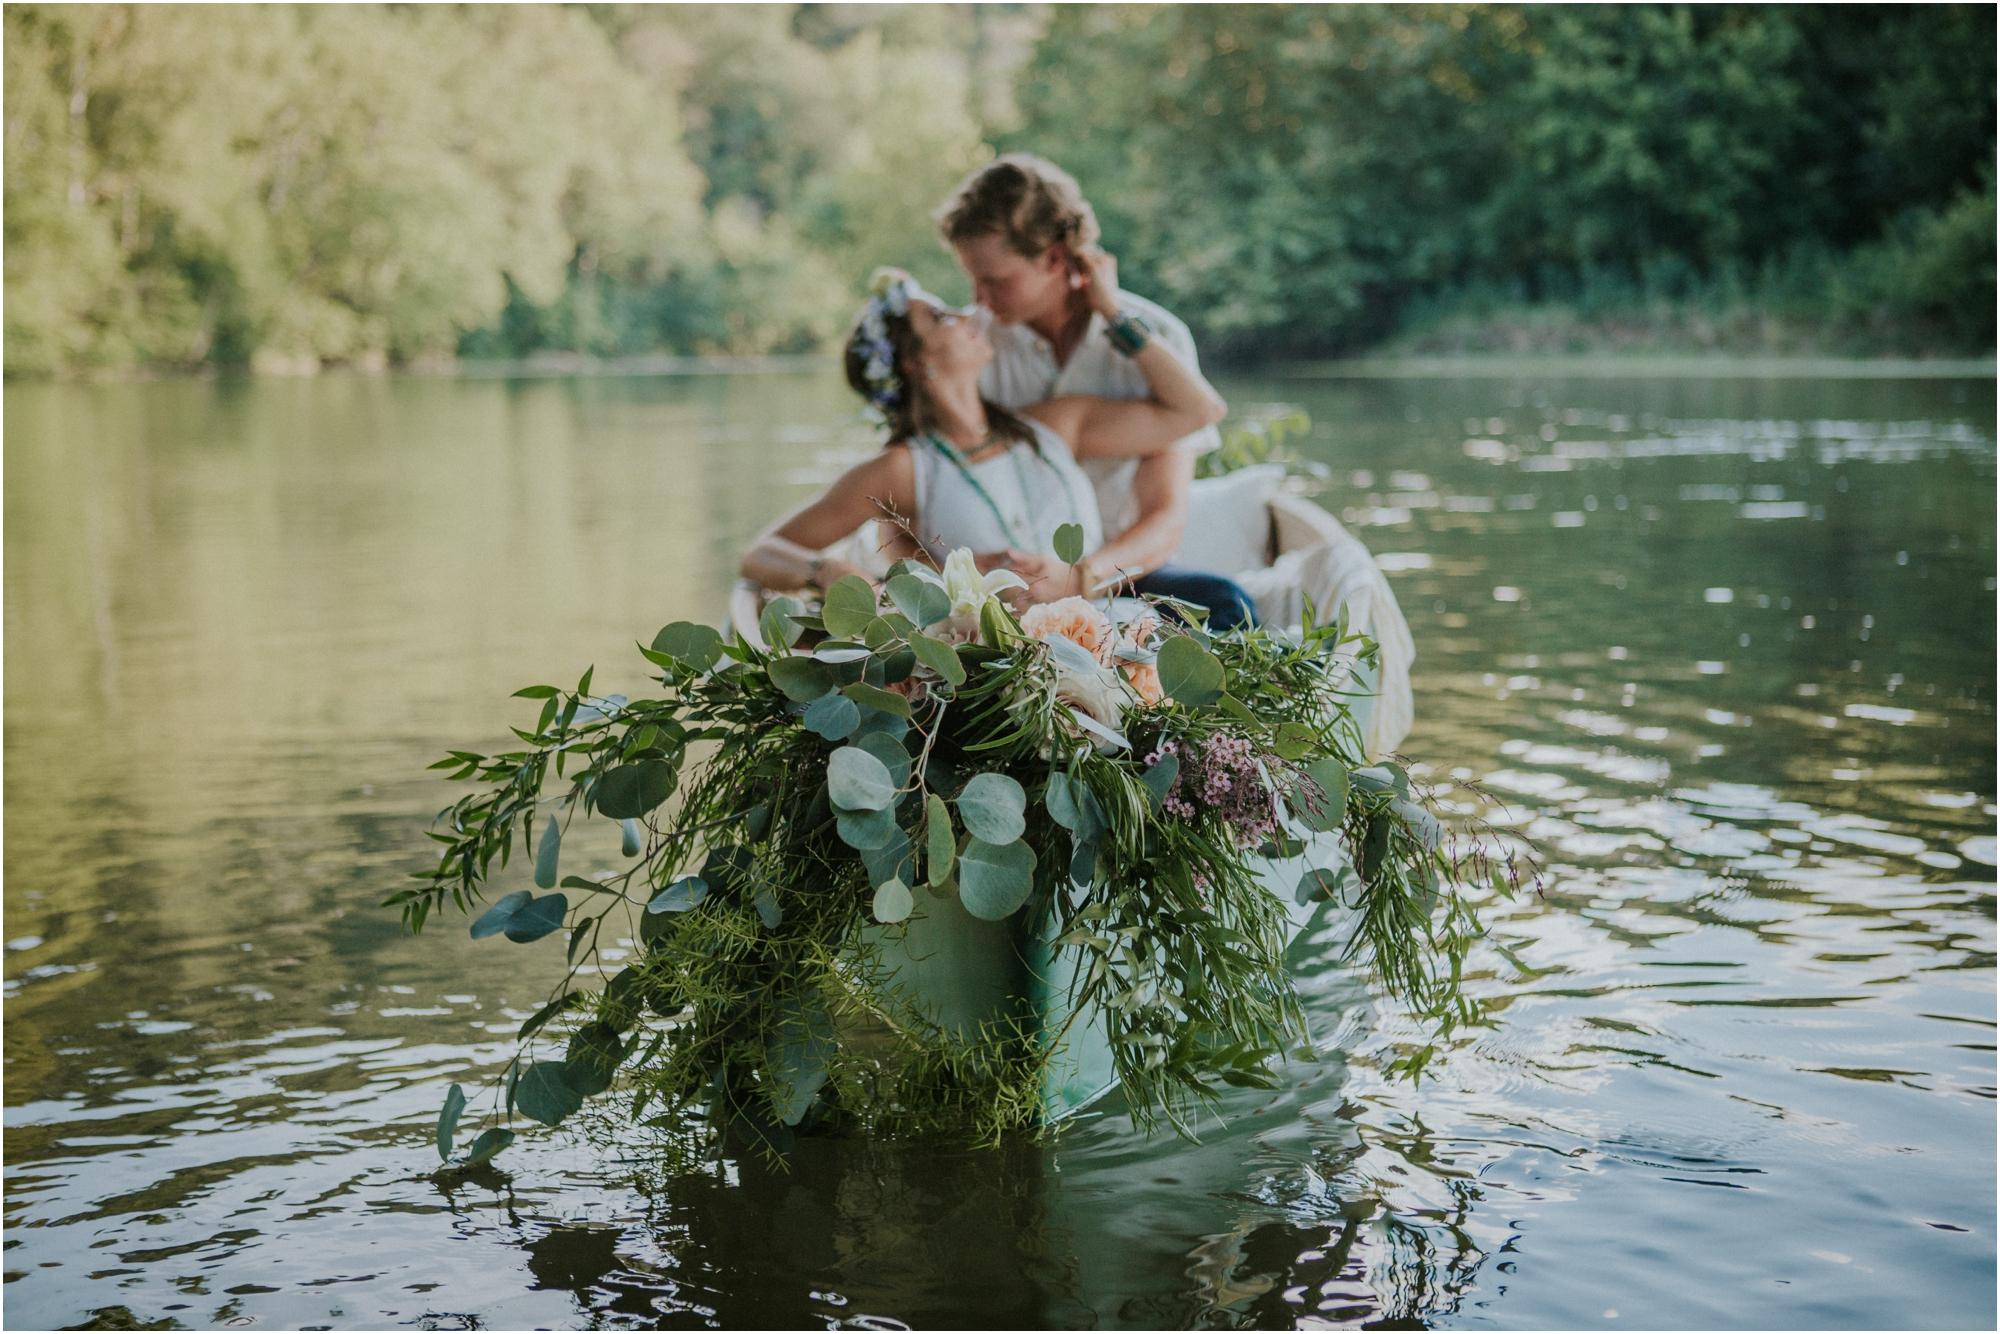 homestead-on-the-holston-hiltons-virginia-bohemian-canoe-styled-shoot-northeast-tennessee-elopement-wild-free-spirit_0015.jpg